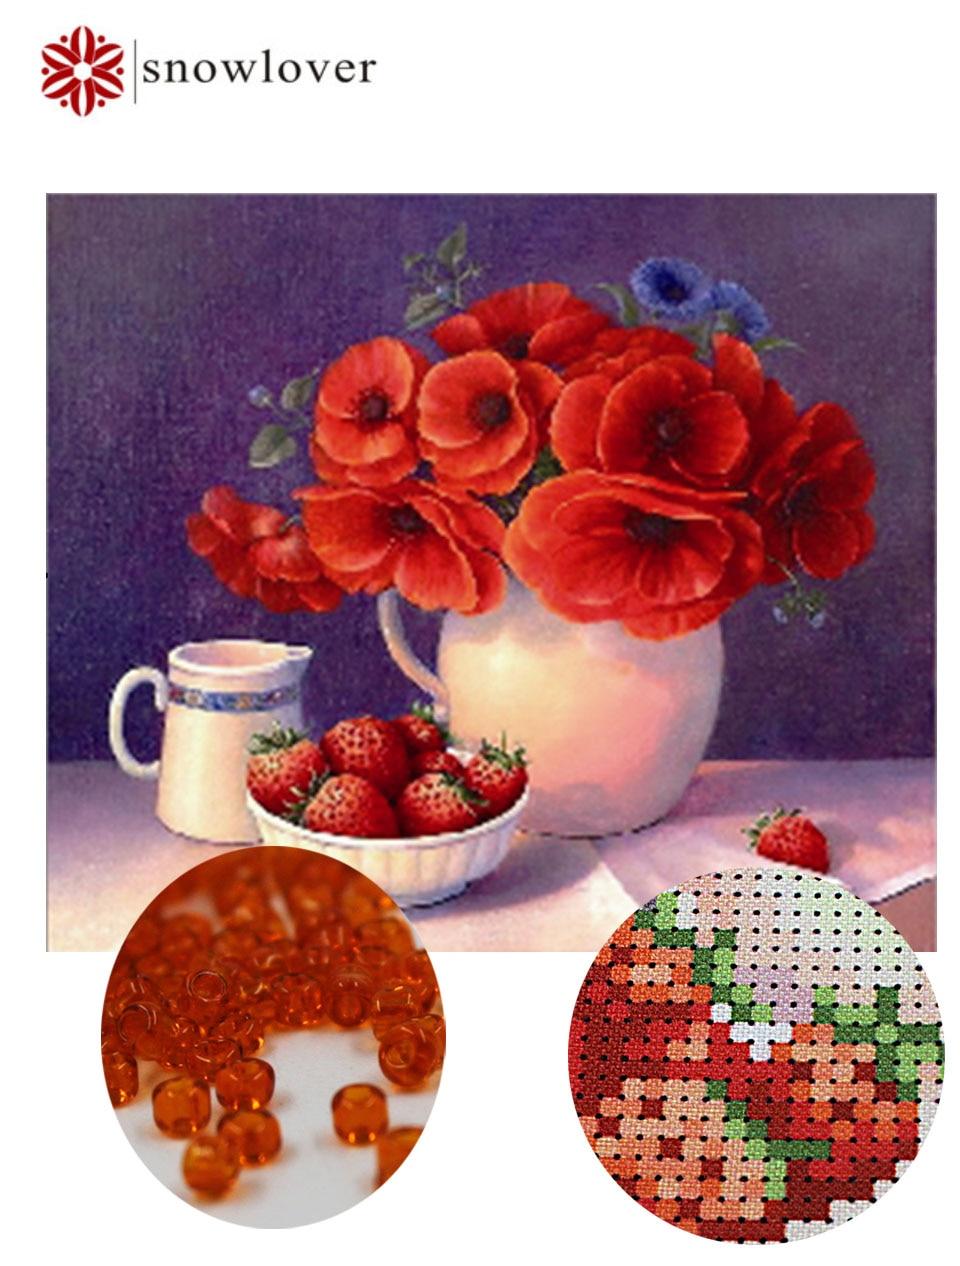 Snowlover, kralen, Handwerken, DIY kraal Kruissteek, Borduurpakketten kruissteek, Nauwkeurig gedrukt bloemenpatroon, kerstcadeaus